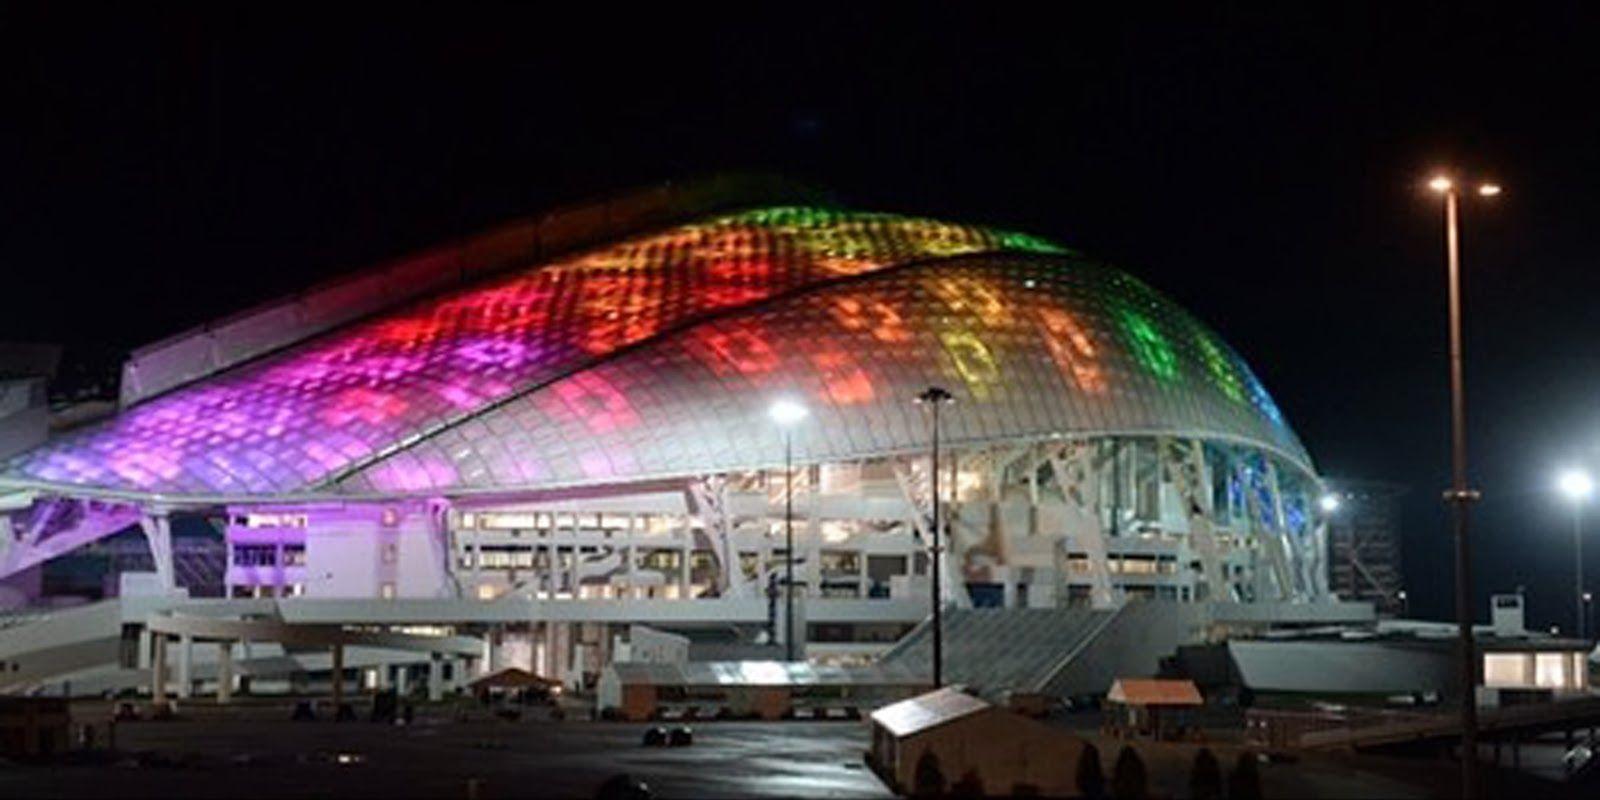 Sochi 2014 Olympic Park Arquitectura, Edificaciones